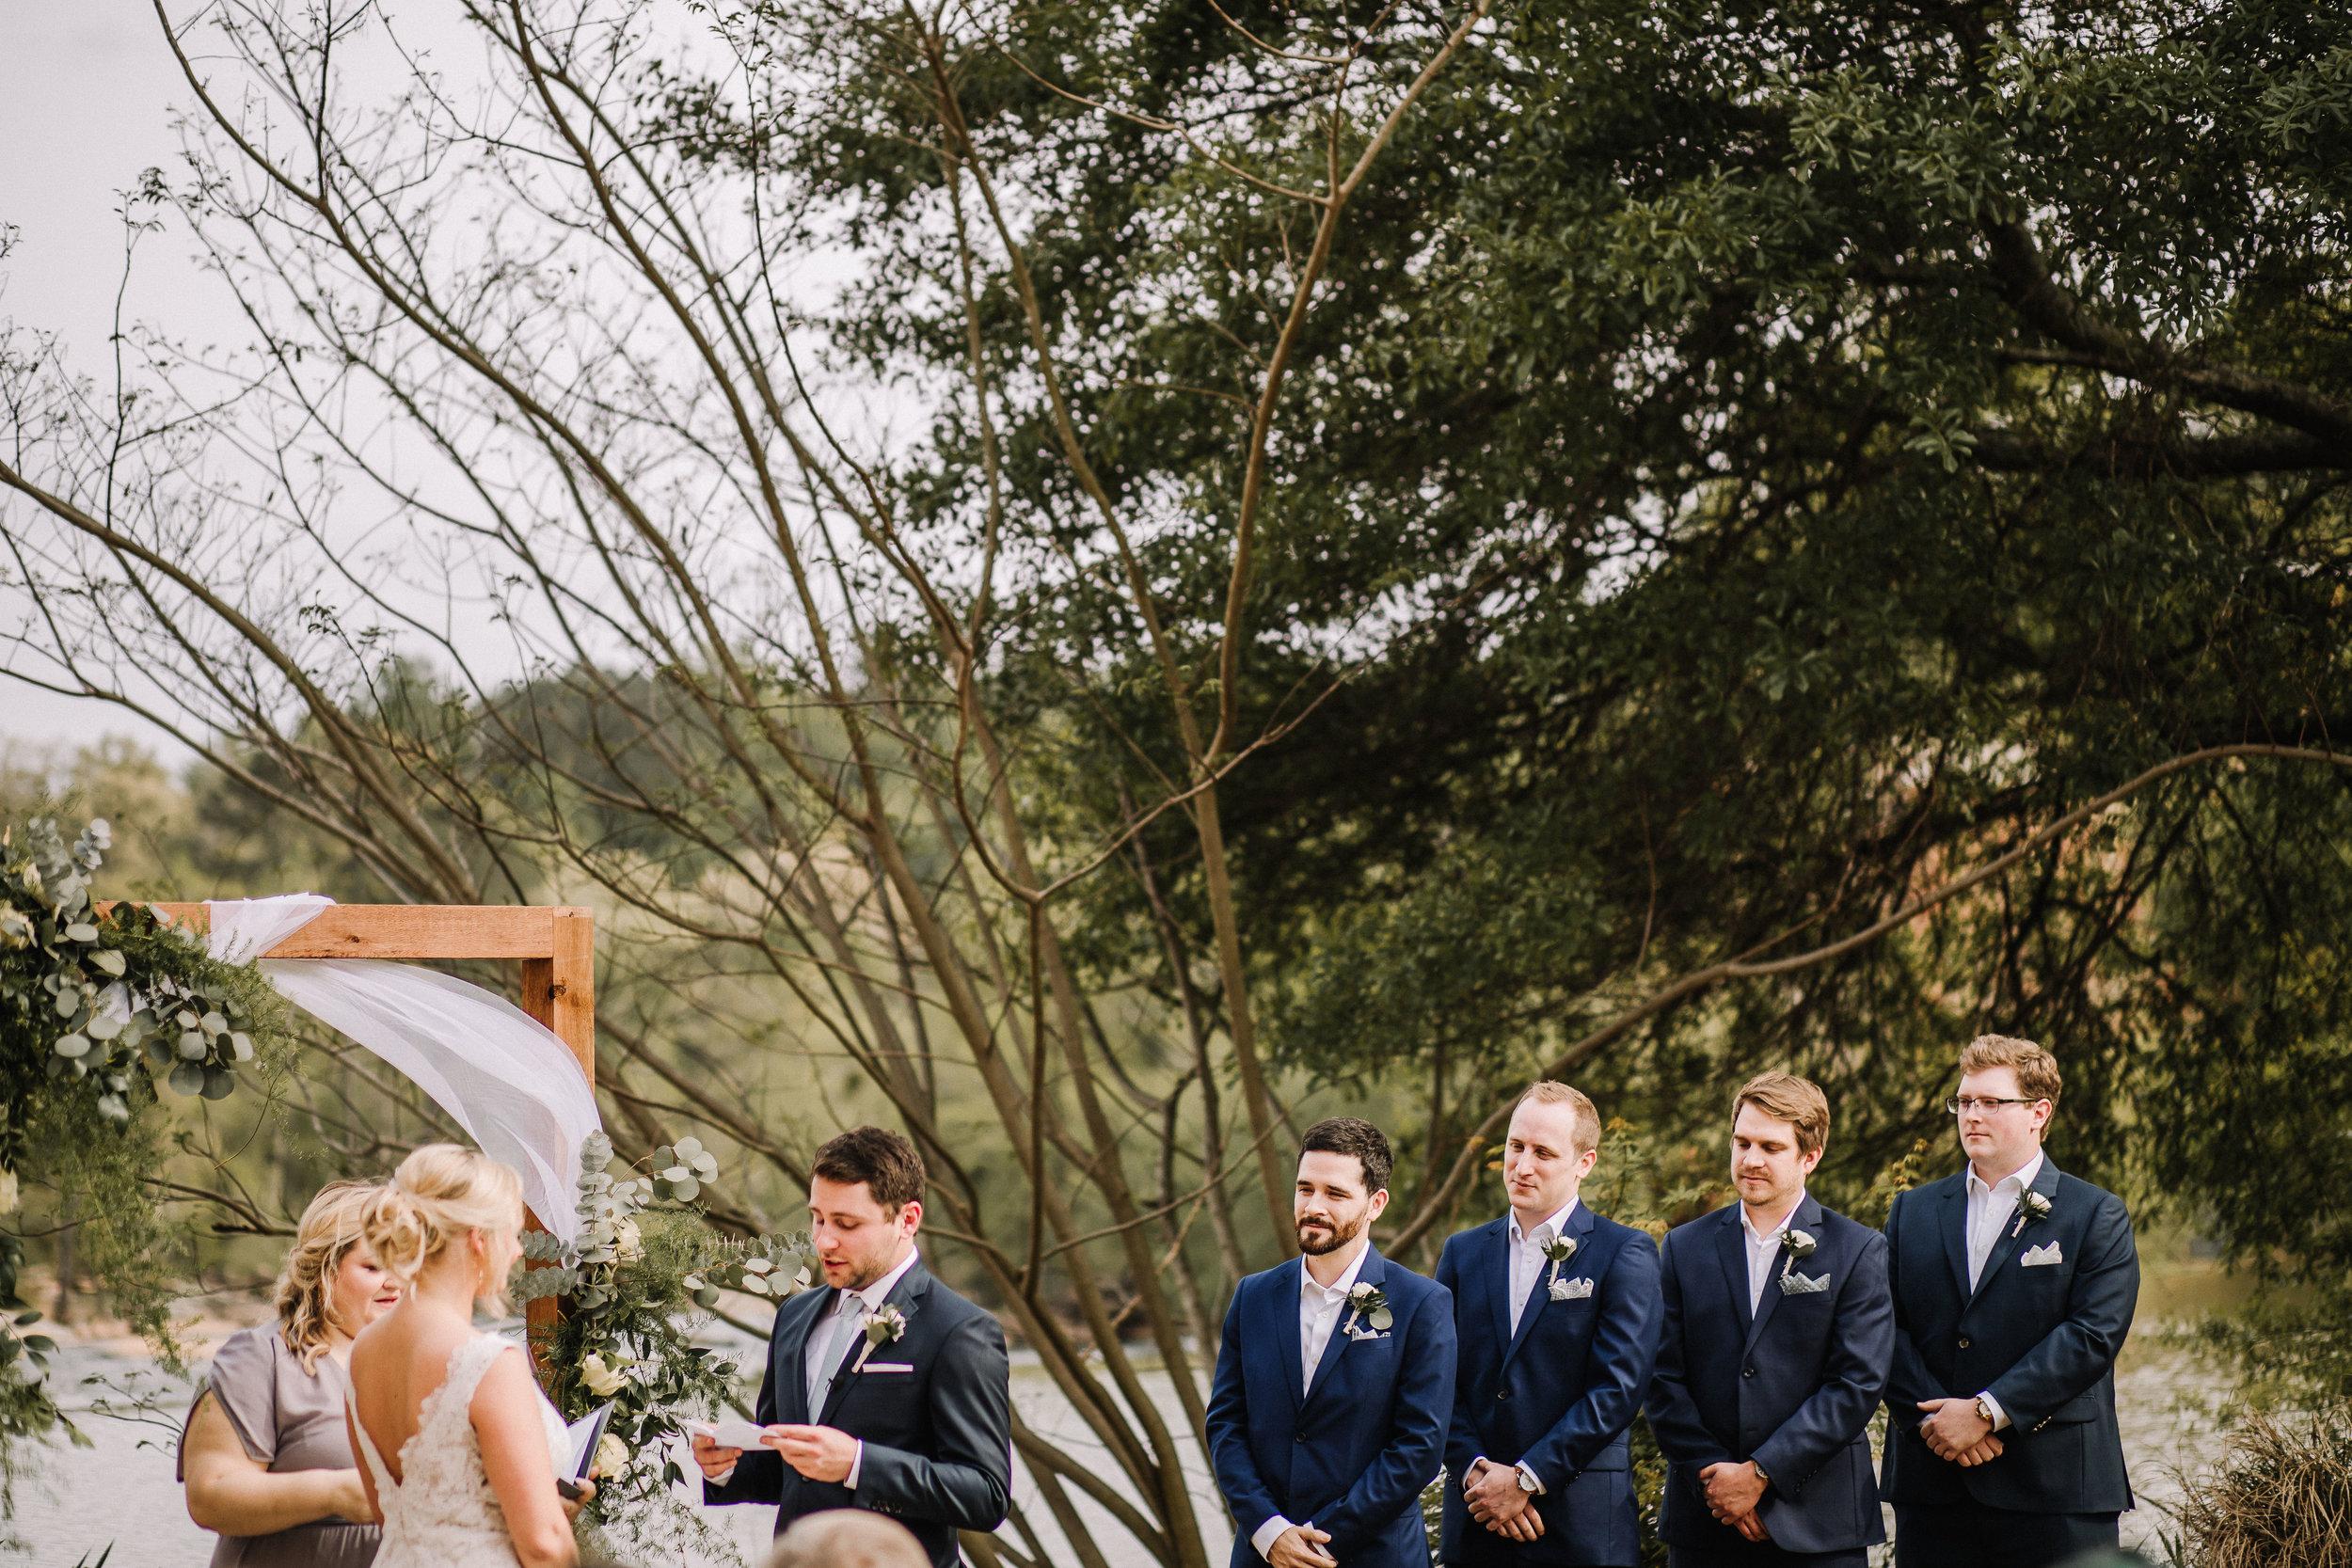 Morgan Wedding_Mill at Yellow River_Ashley Benham Photography-614.jpg